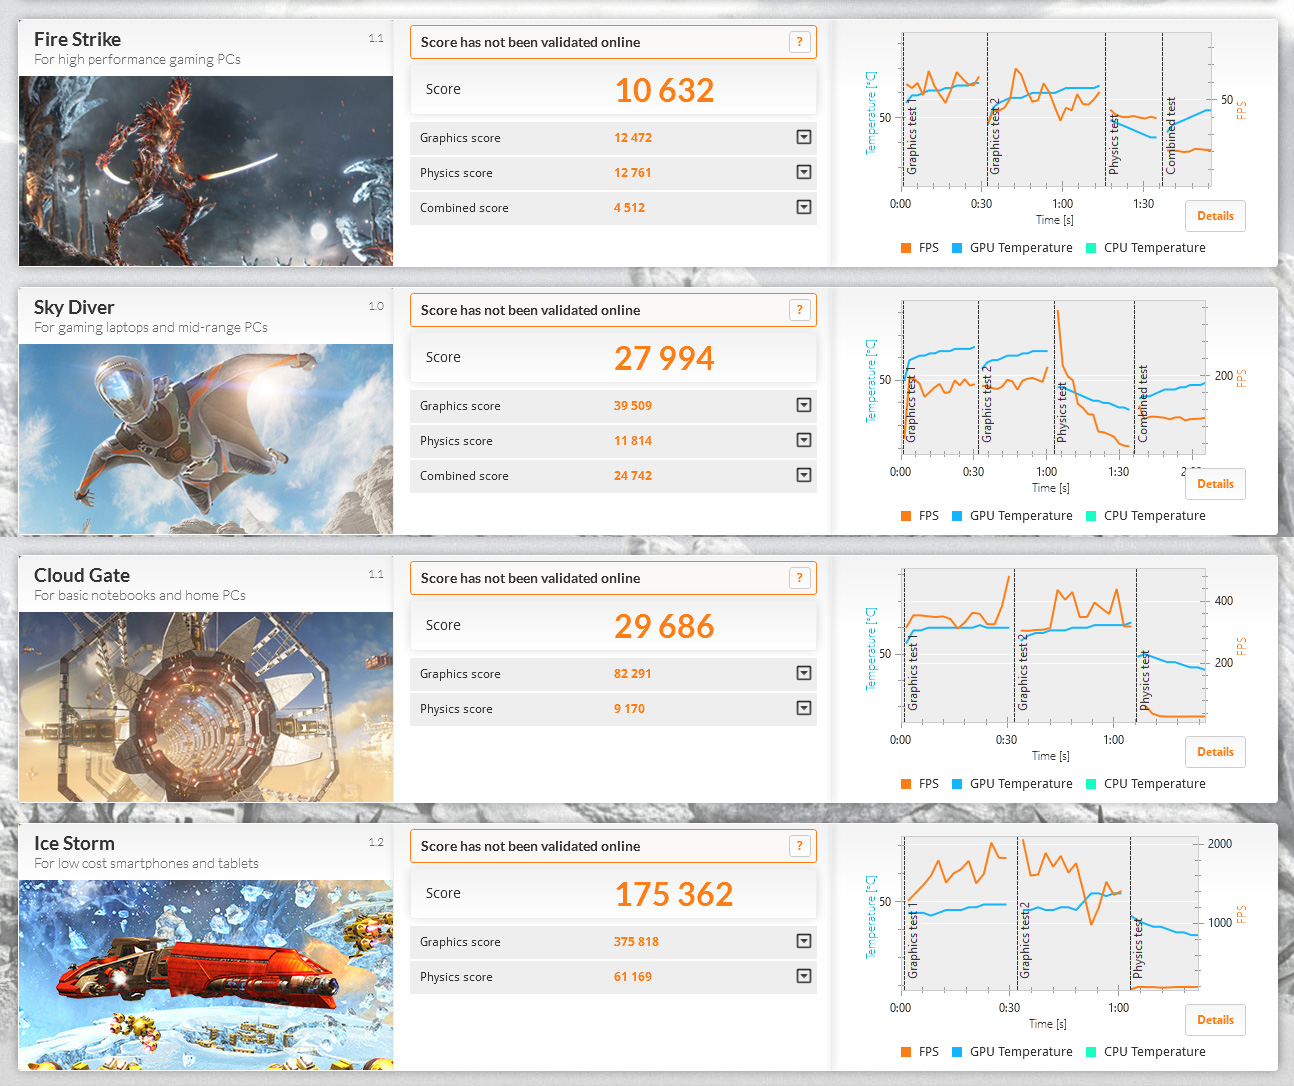 3DMark。Ice Storm 175362、Cloud Gate 29686、Sky Diver 27994、Fire Strike 10632